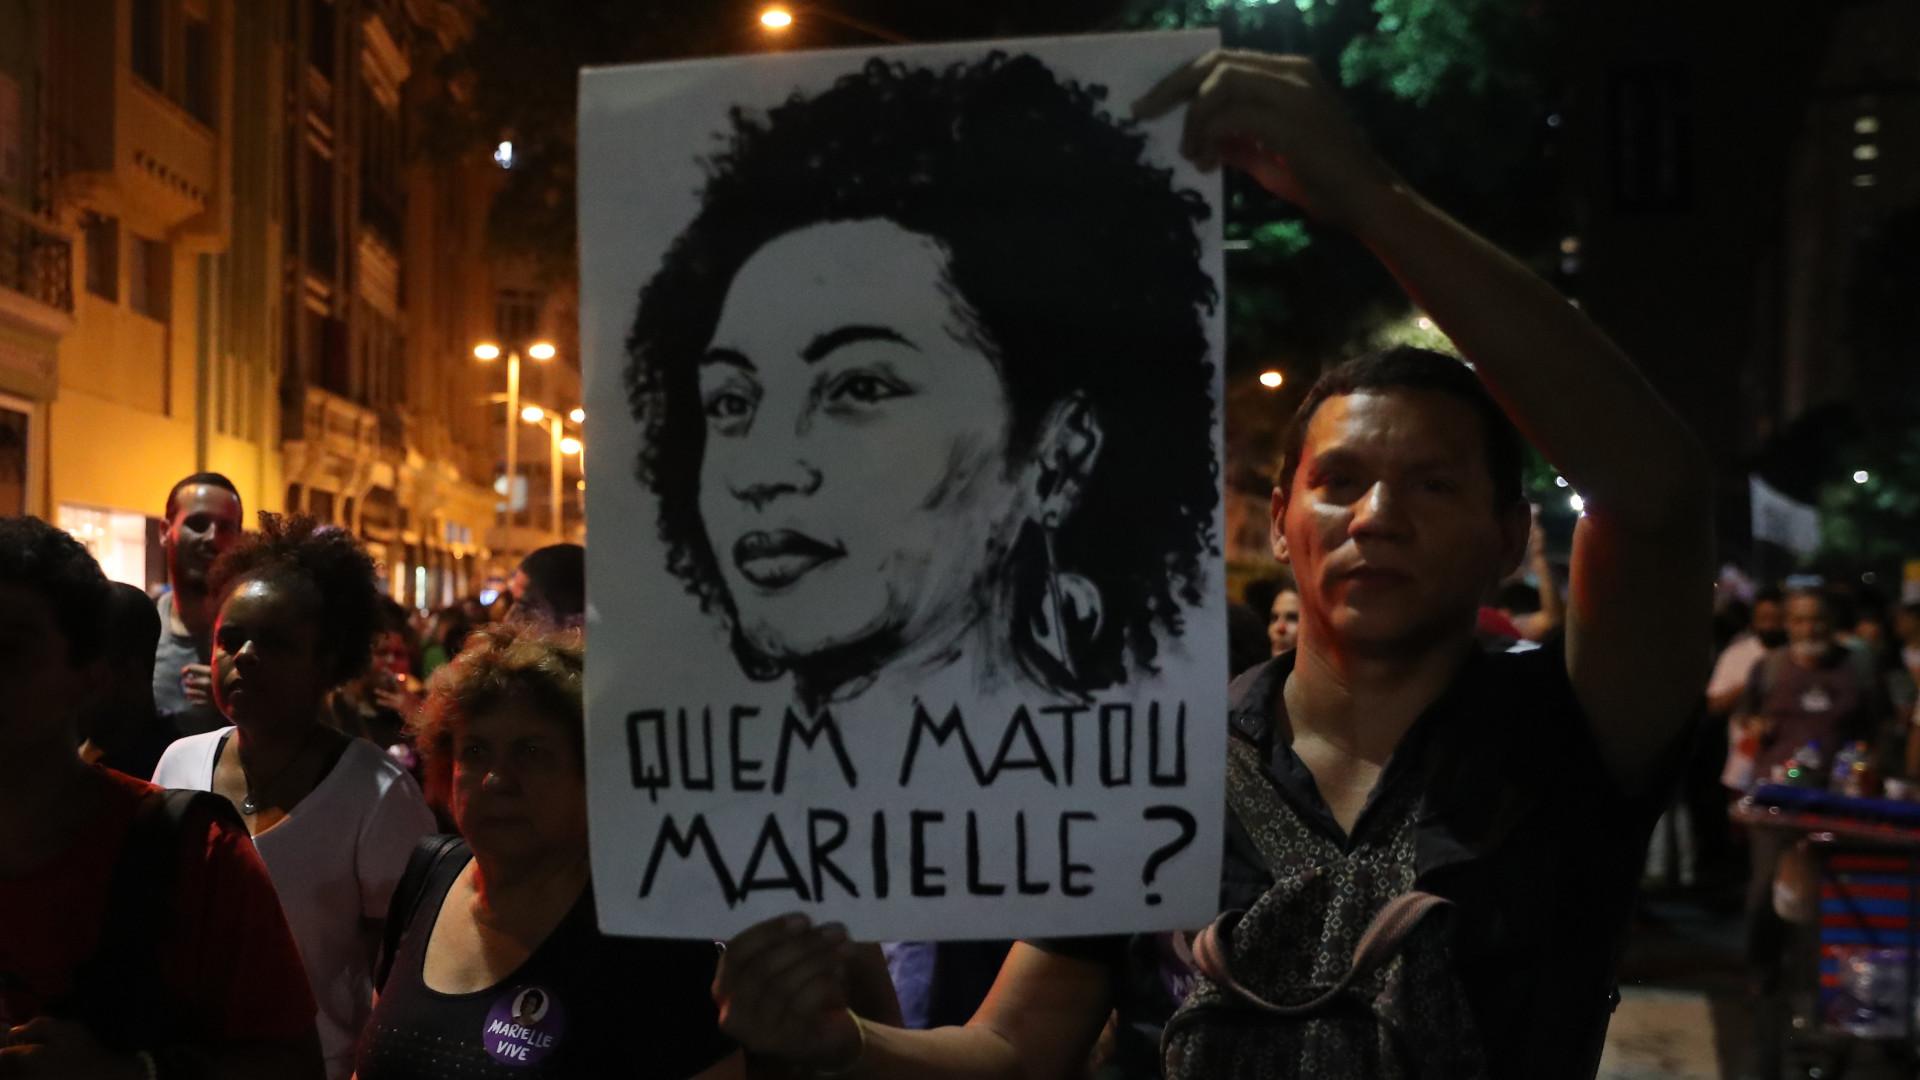 Autoridades supeitam de milícias no homicídio de Marielle Franco